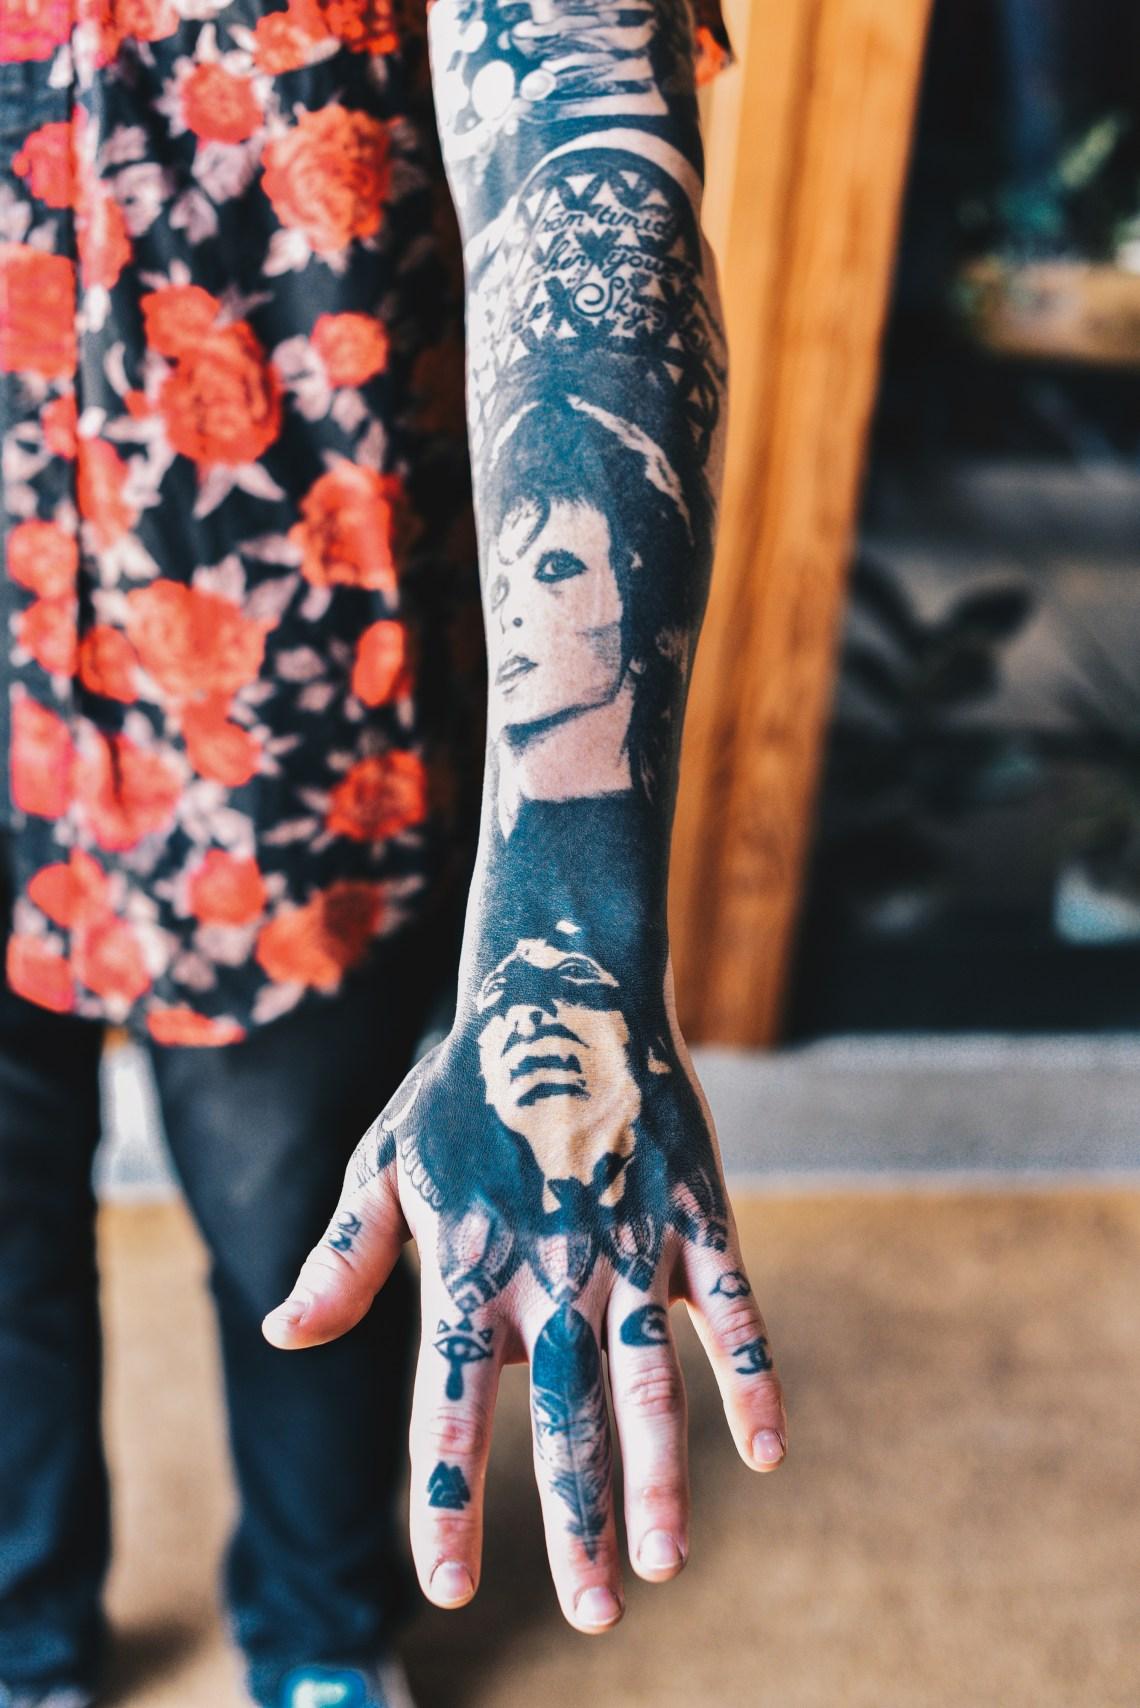 Barista-Tattoos-13